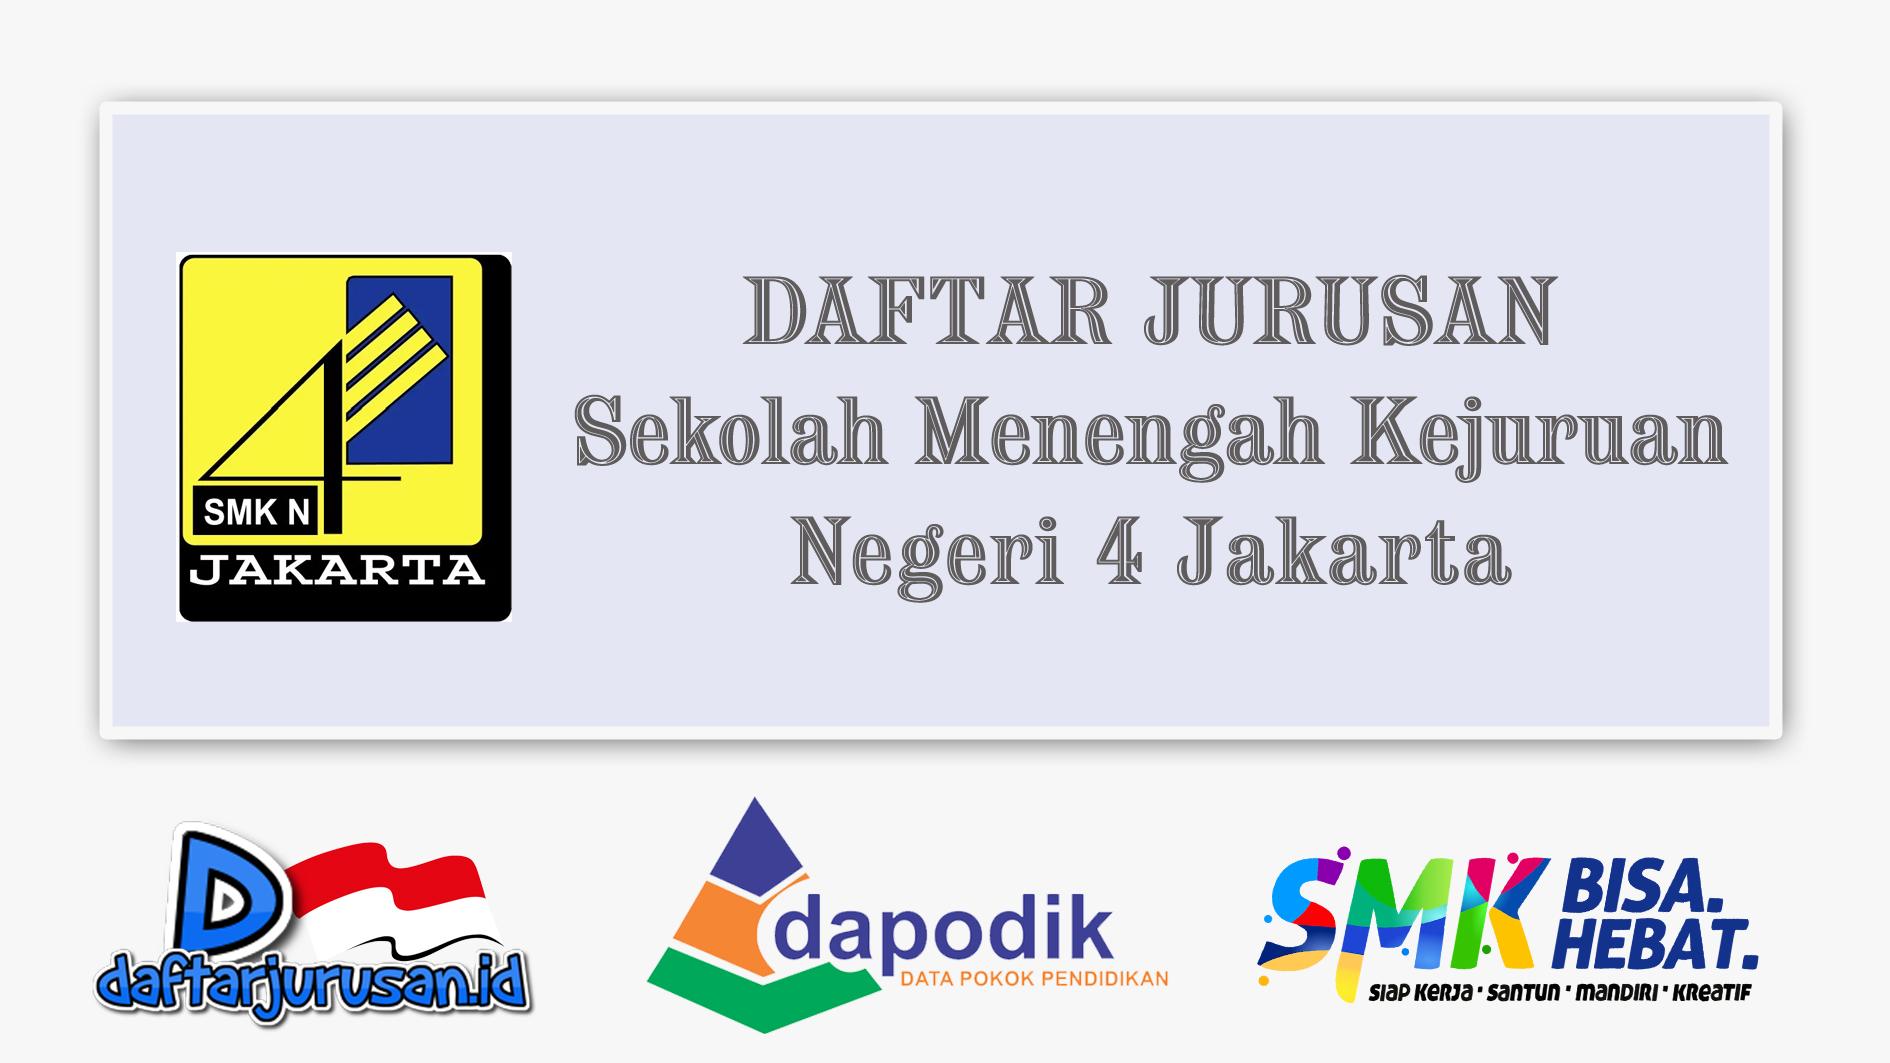 Daftar Jurusan SMK Negeri 4 Jakarta Utara